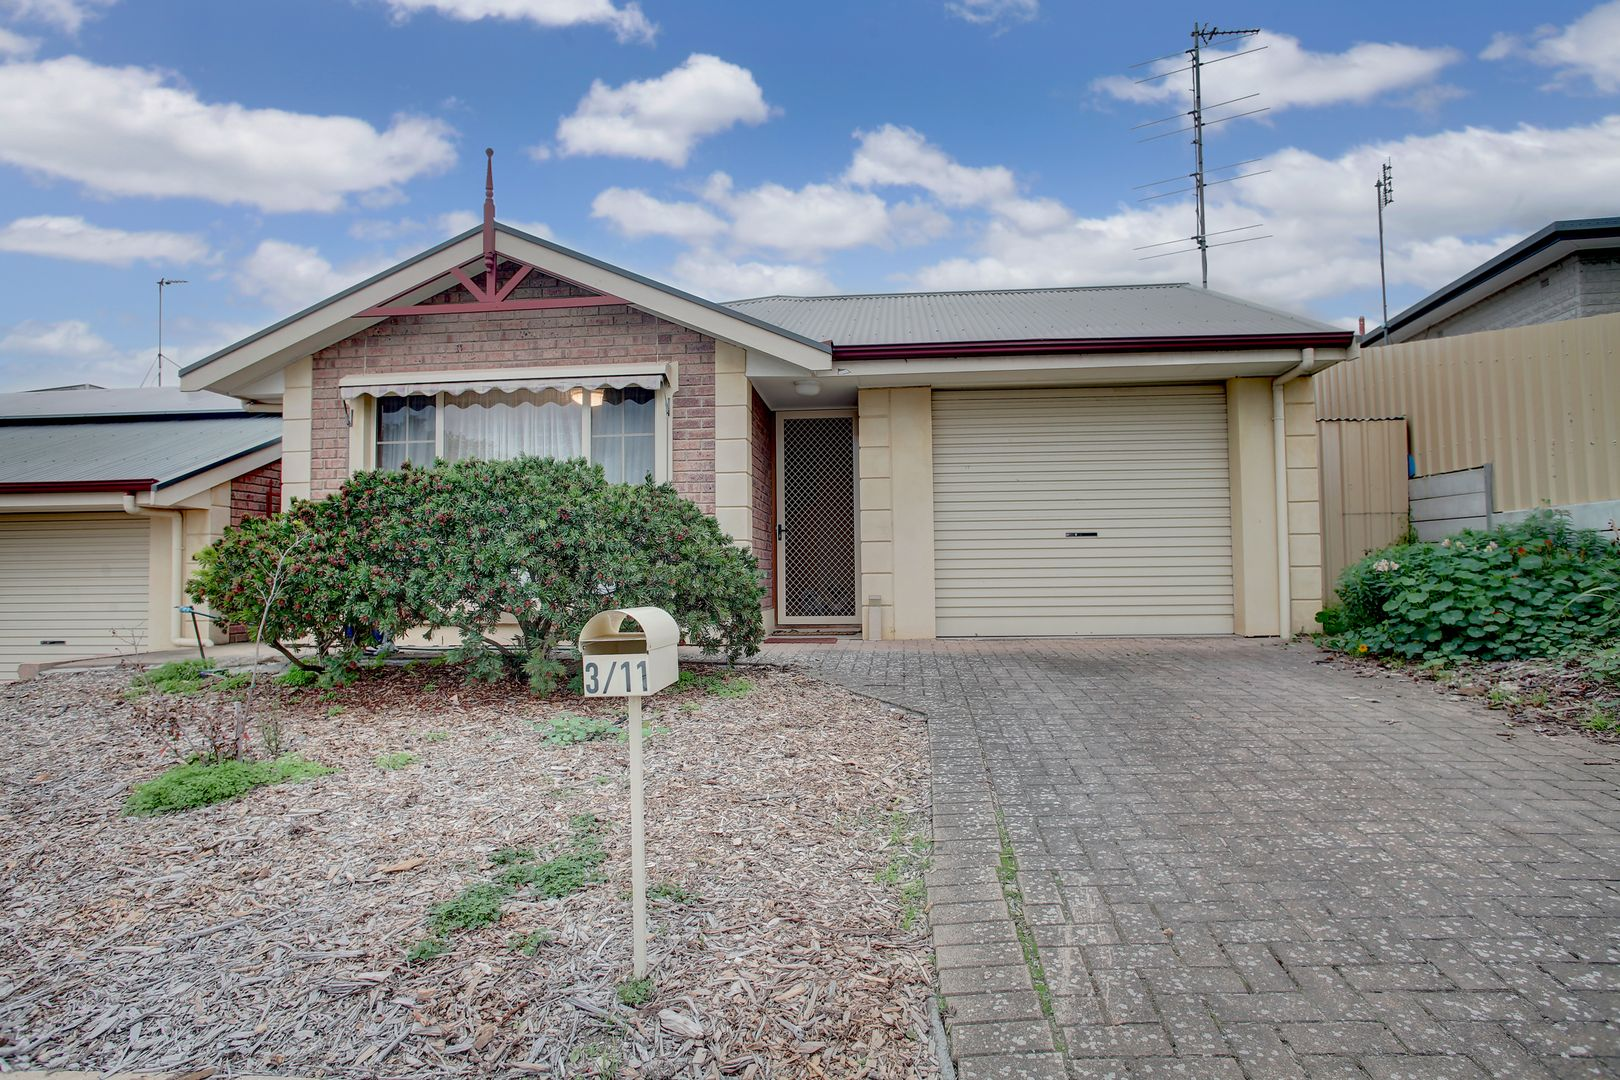 3/11 Stuart Terrace, Port Lincoln SA 5606, Image 1